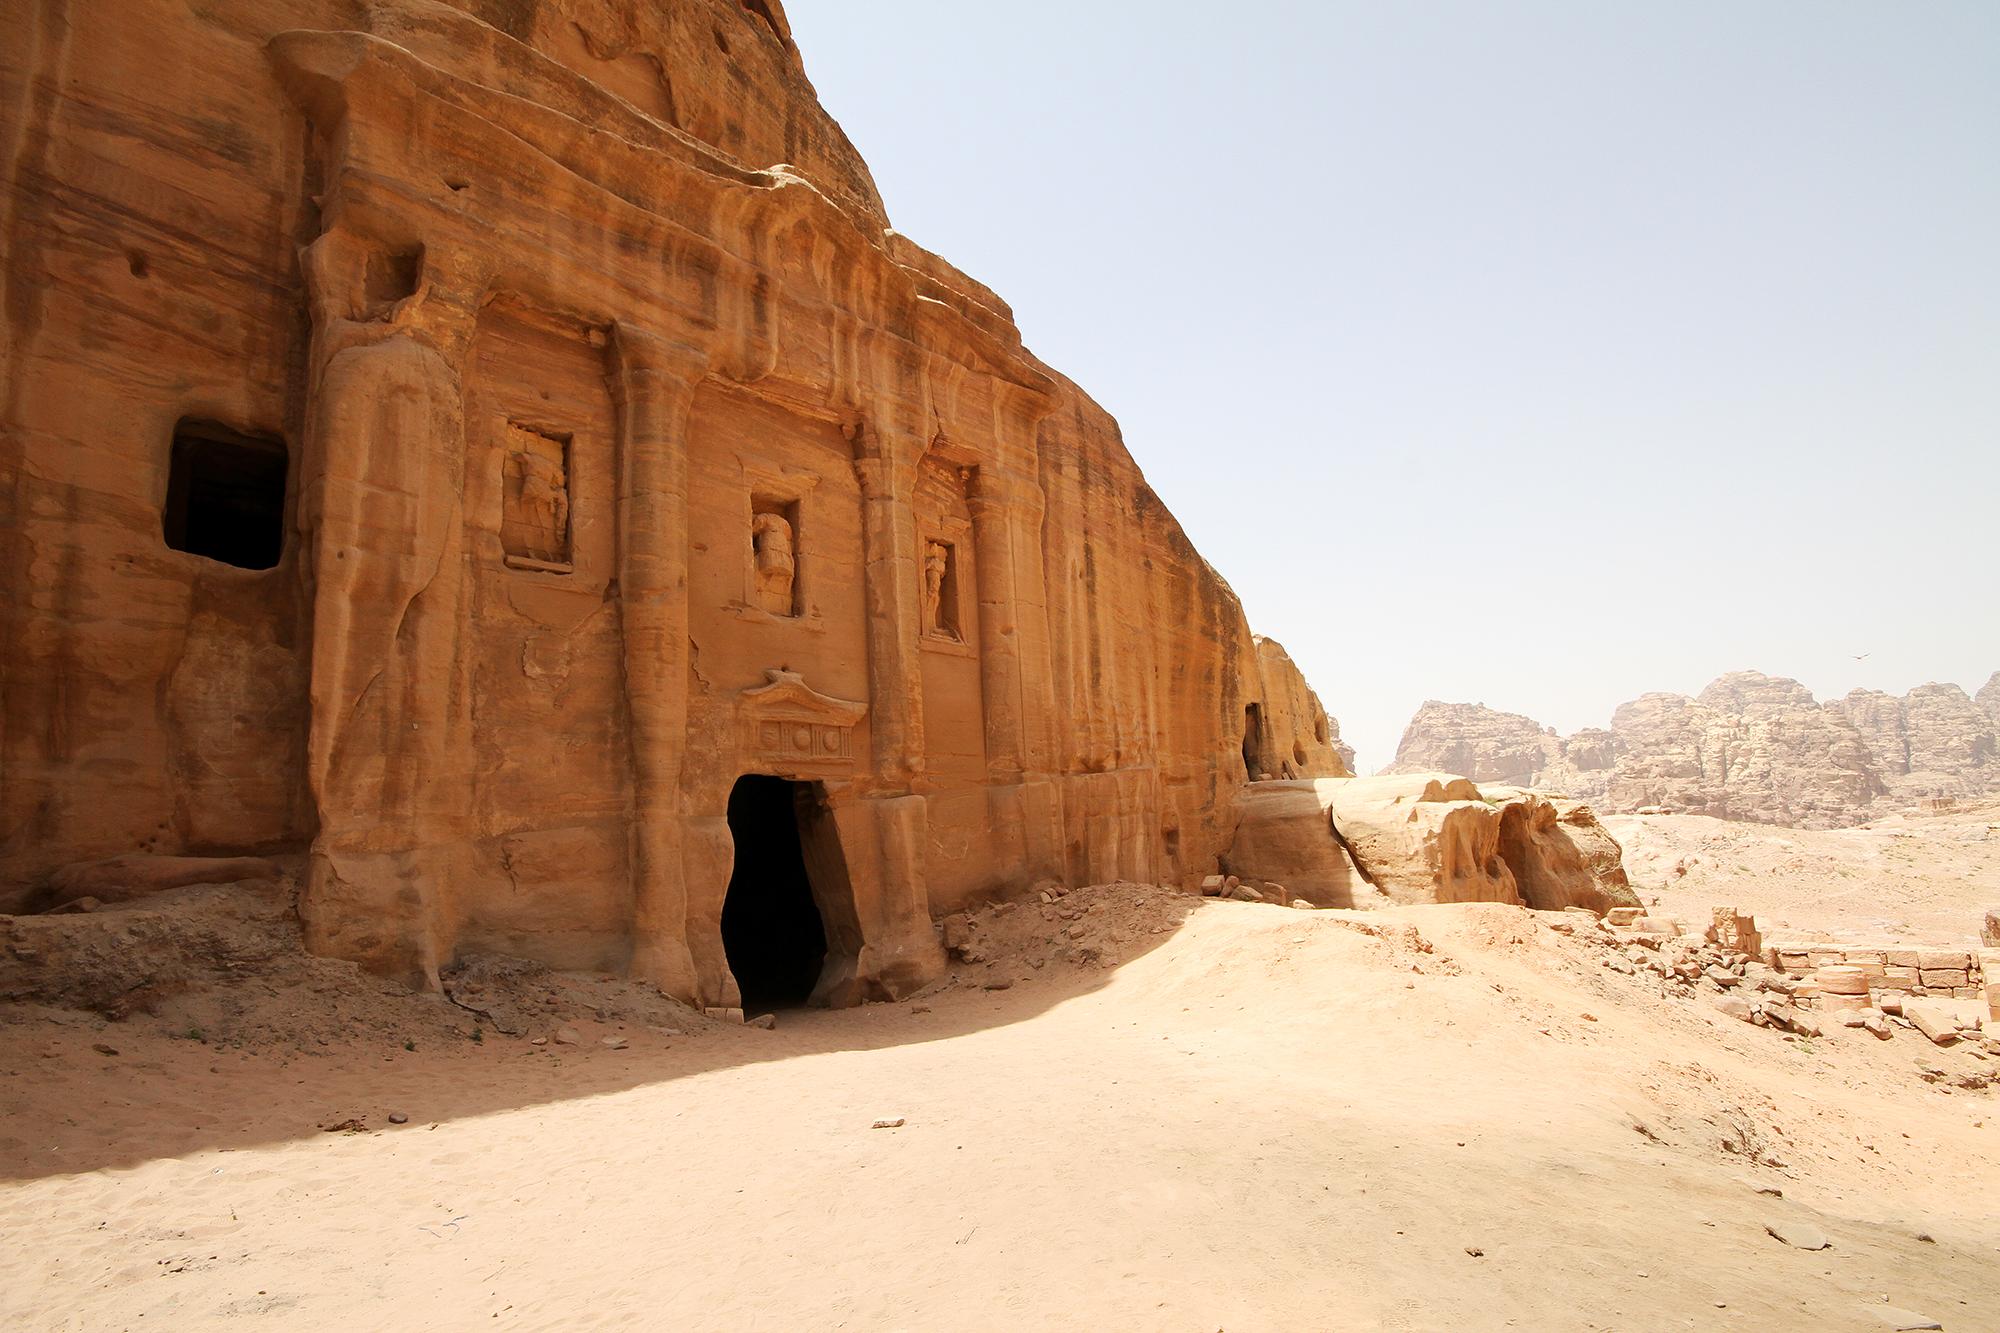 Soldier's Tomb